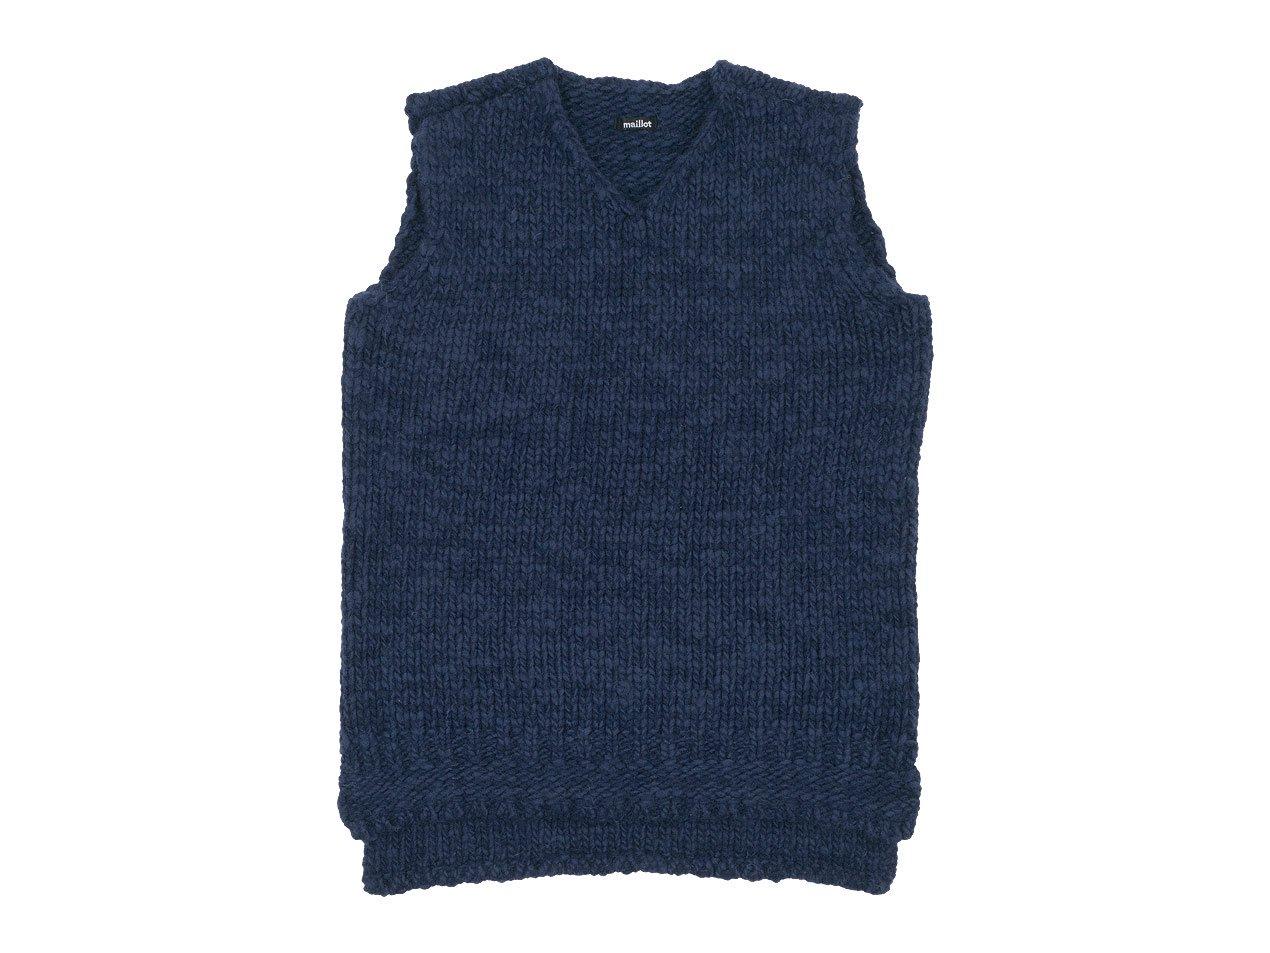 maillot mature hand frame vest NAVY